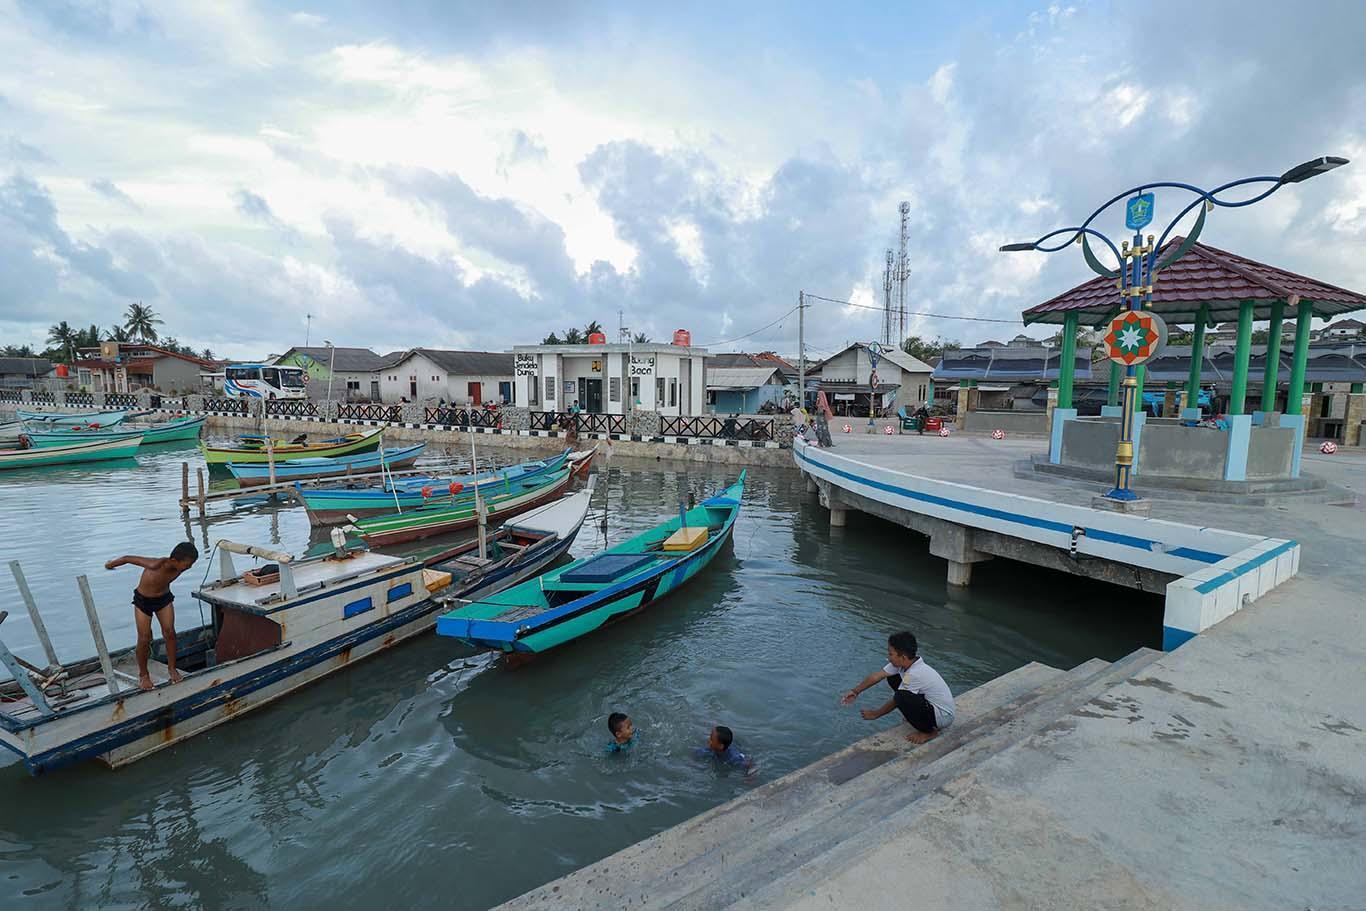 FOTO: Wajah Baru Kampung Nelayan 1 Sungailiat